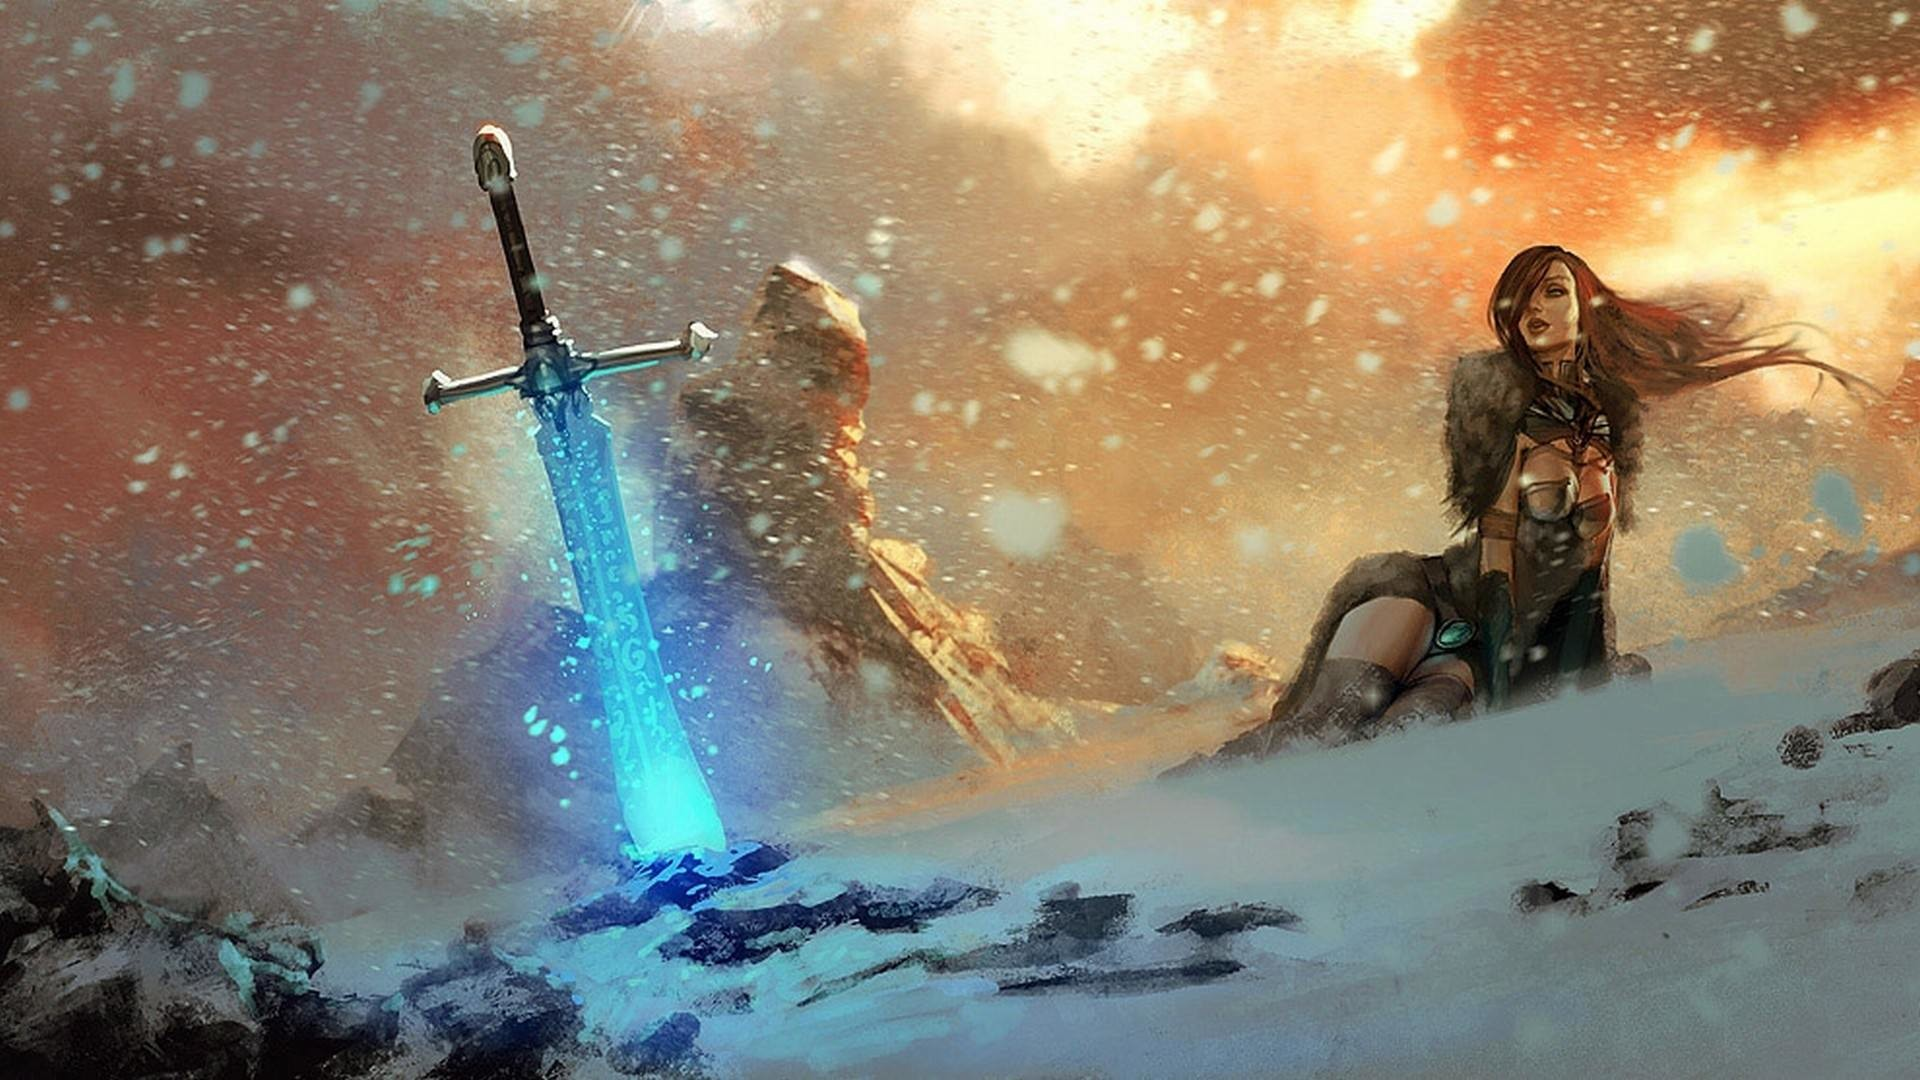 … fantasy art magic mountain female sword wallpaper digitalart io …